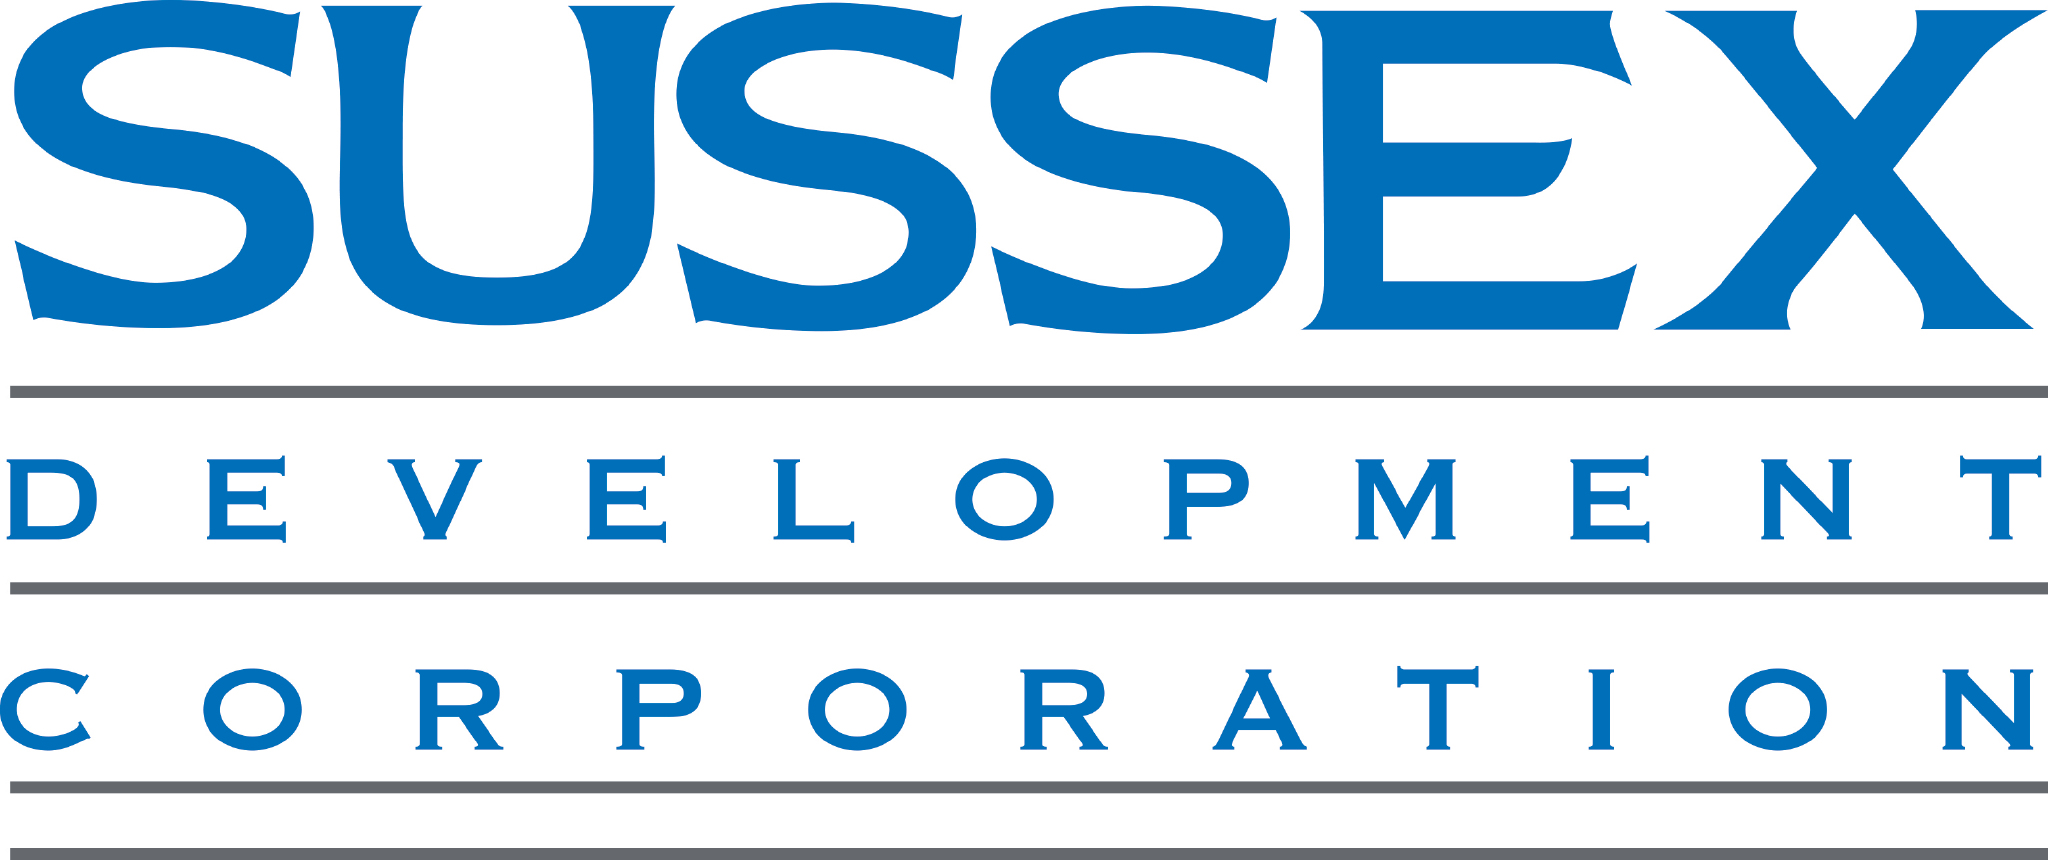 2016 Sussex Logo (CMYK)